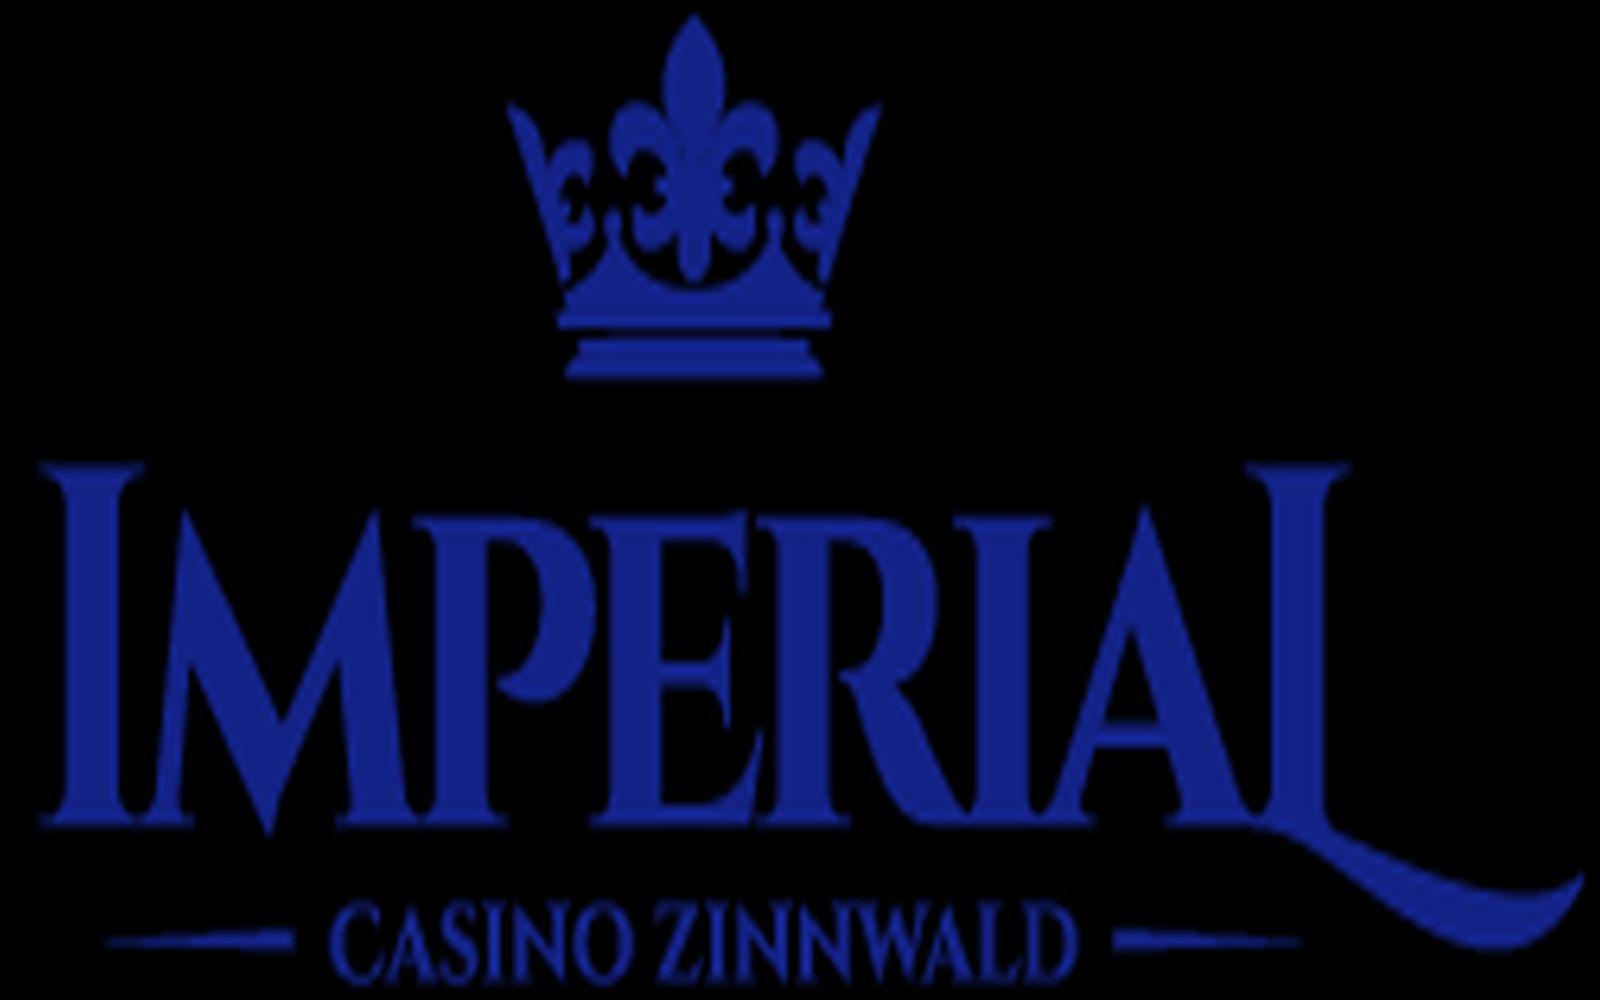 Imperial Zinnwald